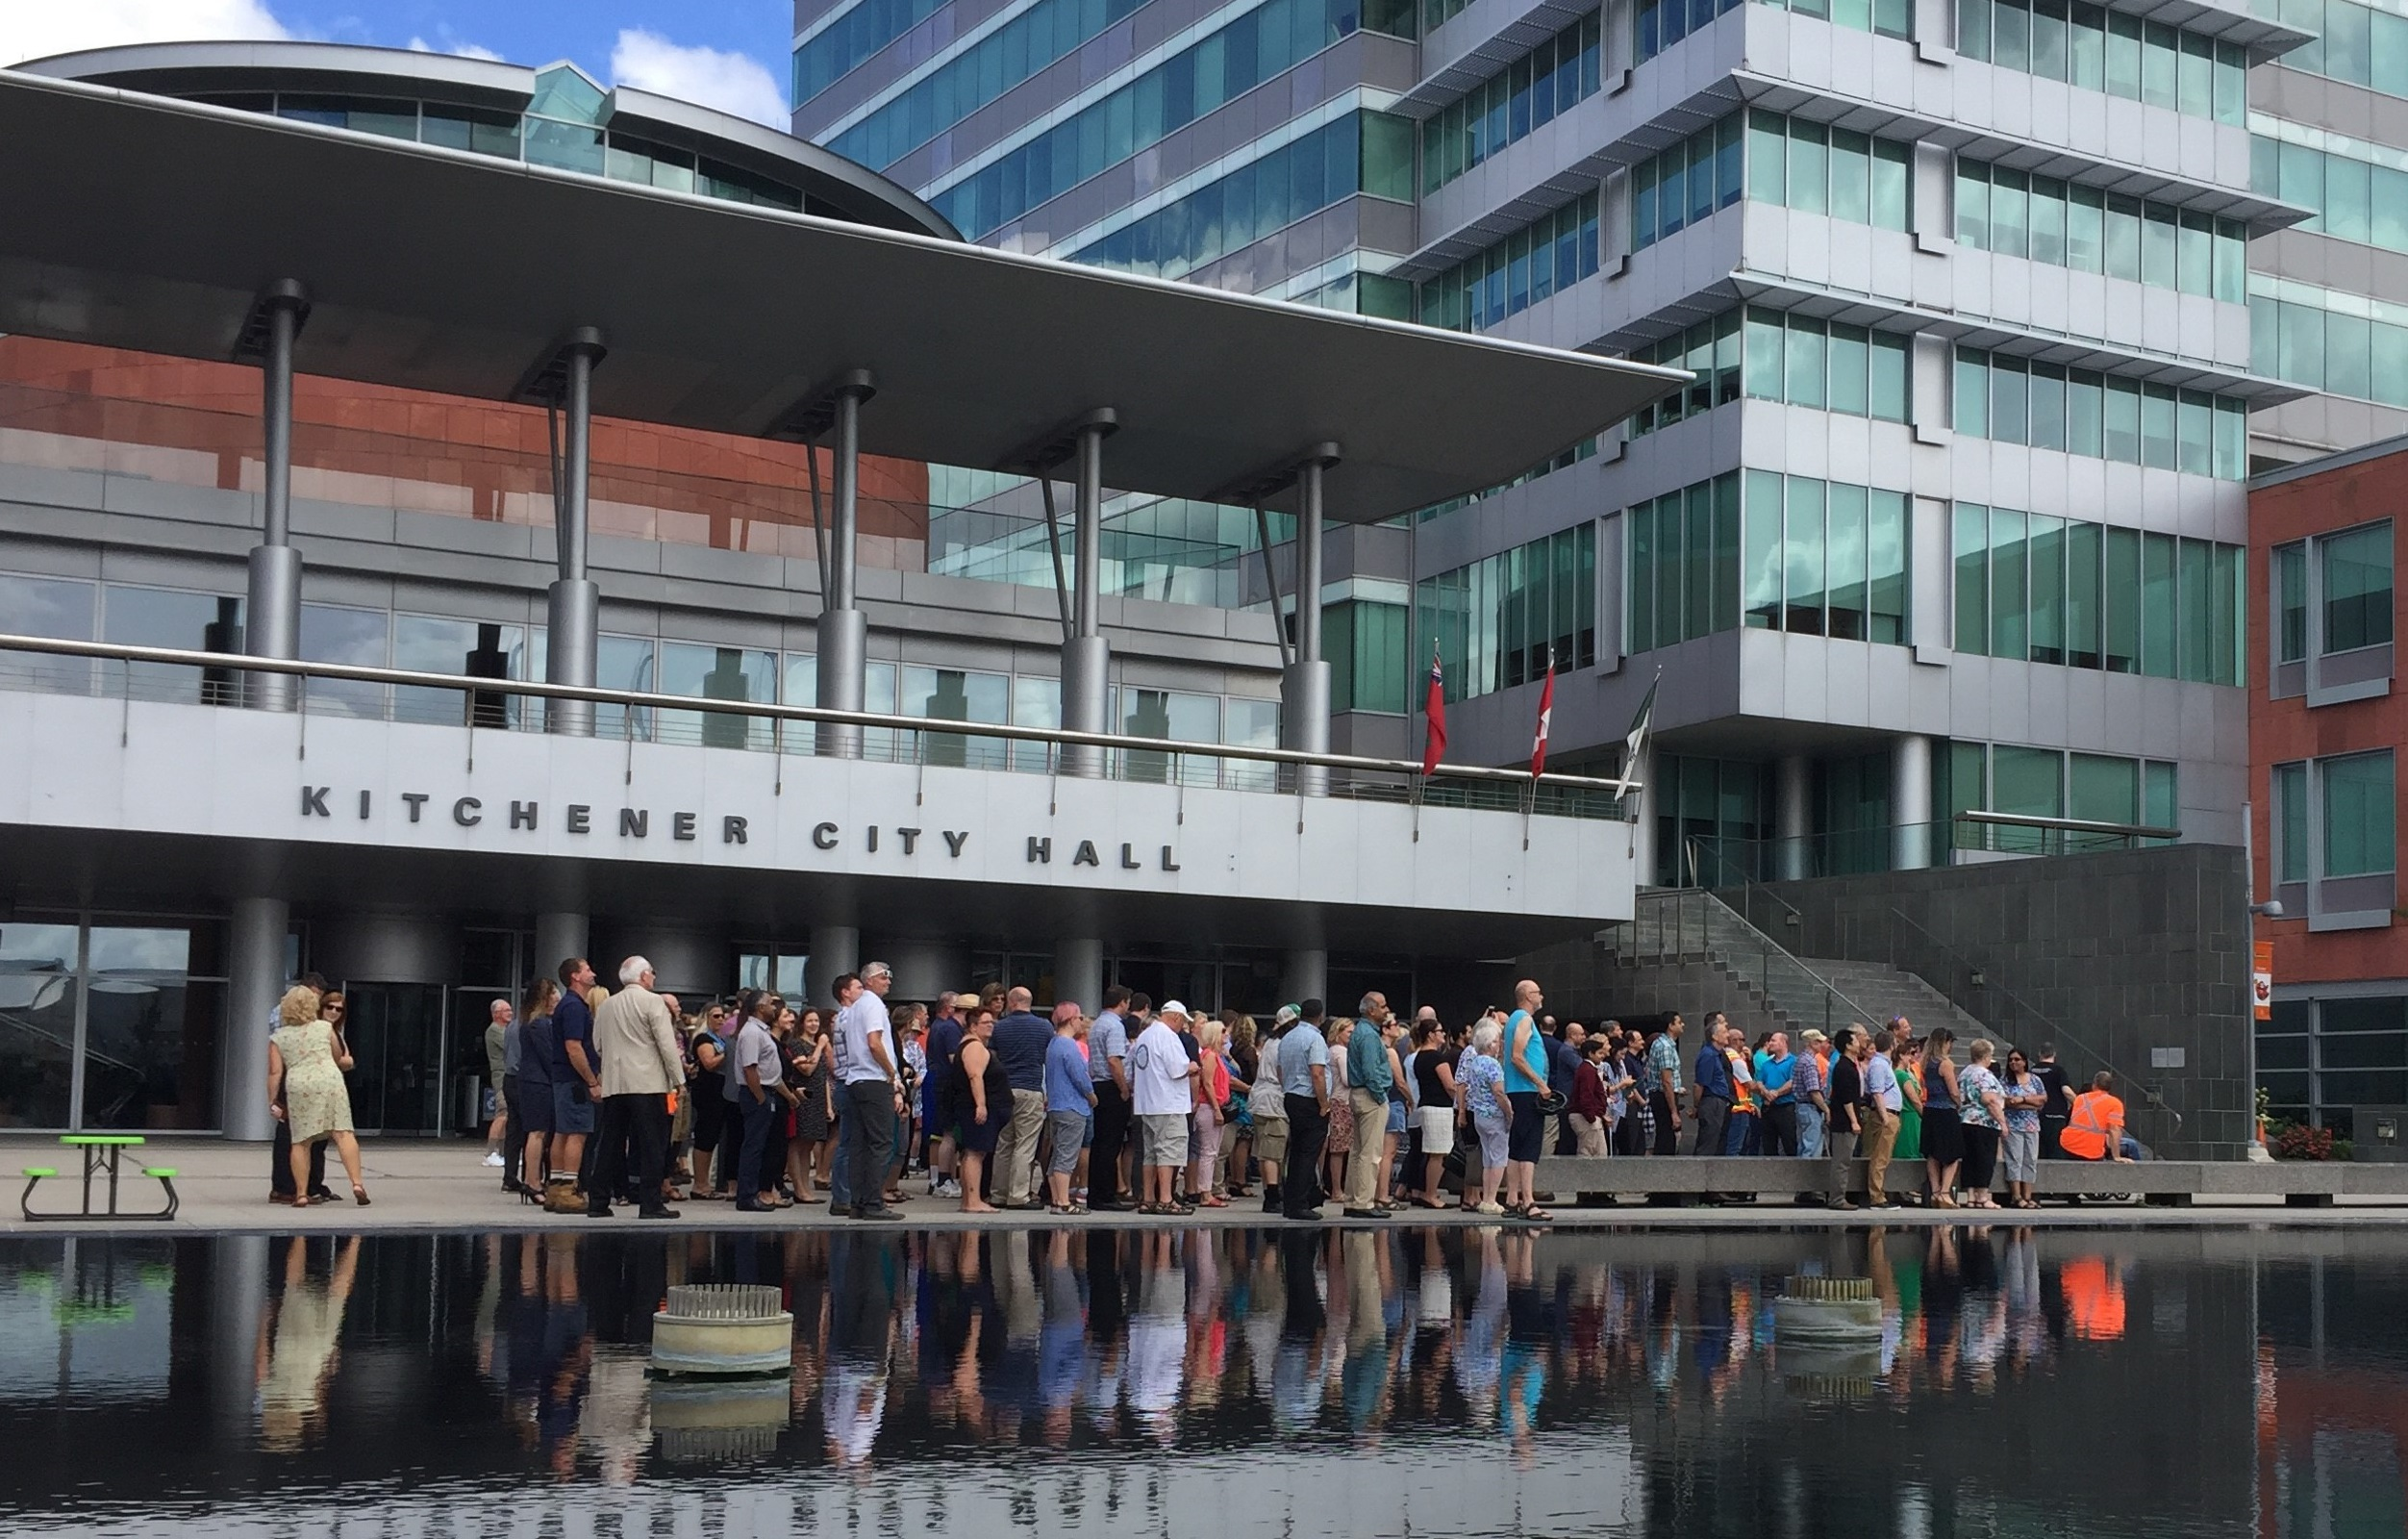 Residents celebrate Kitchener City Hall's 25 year